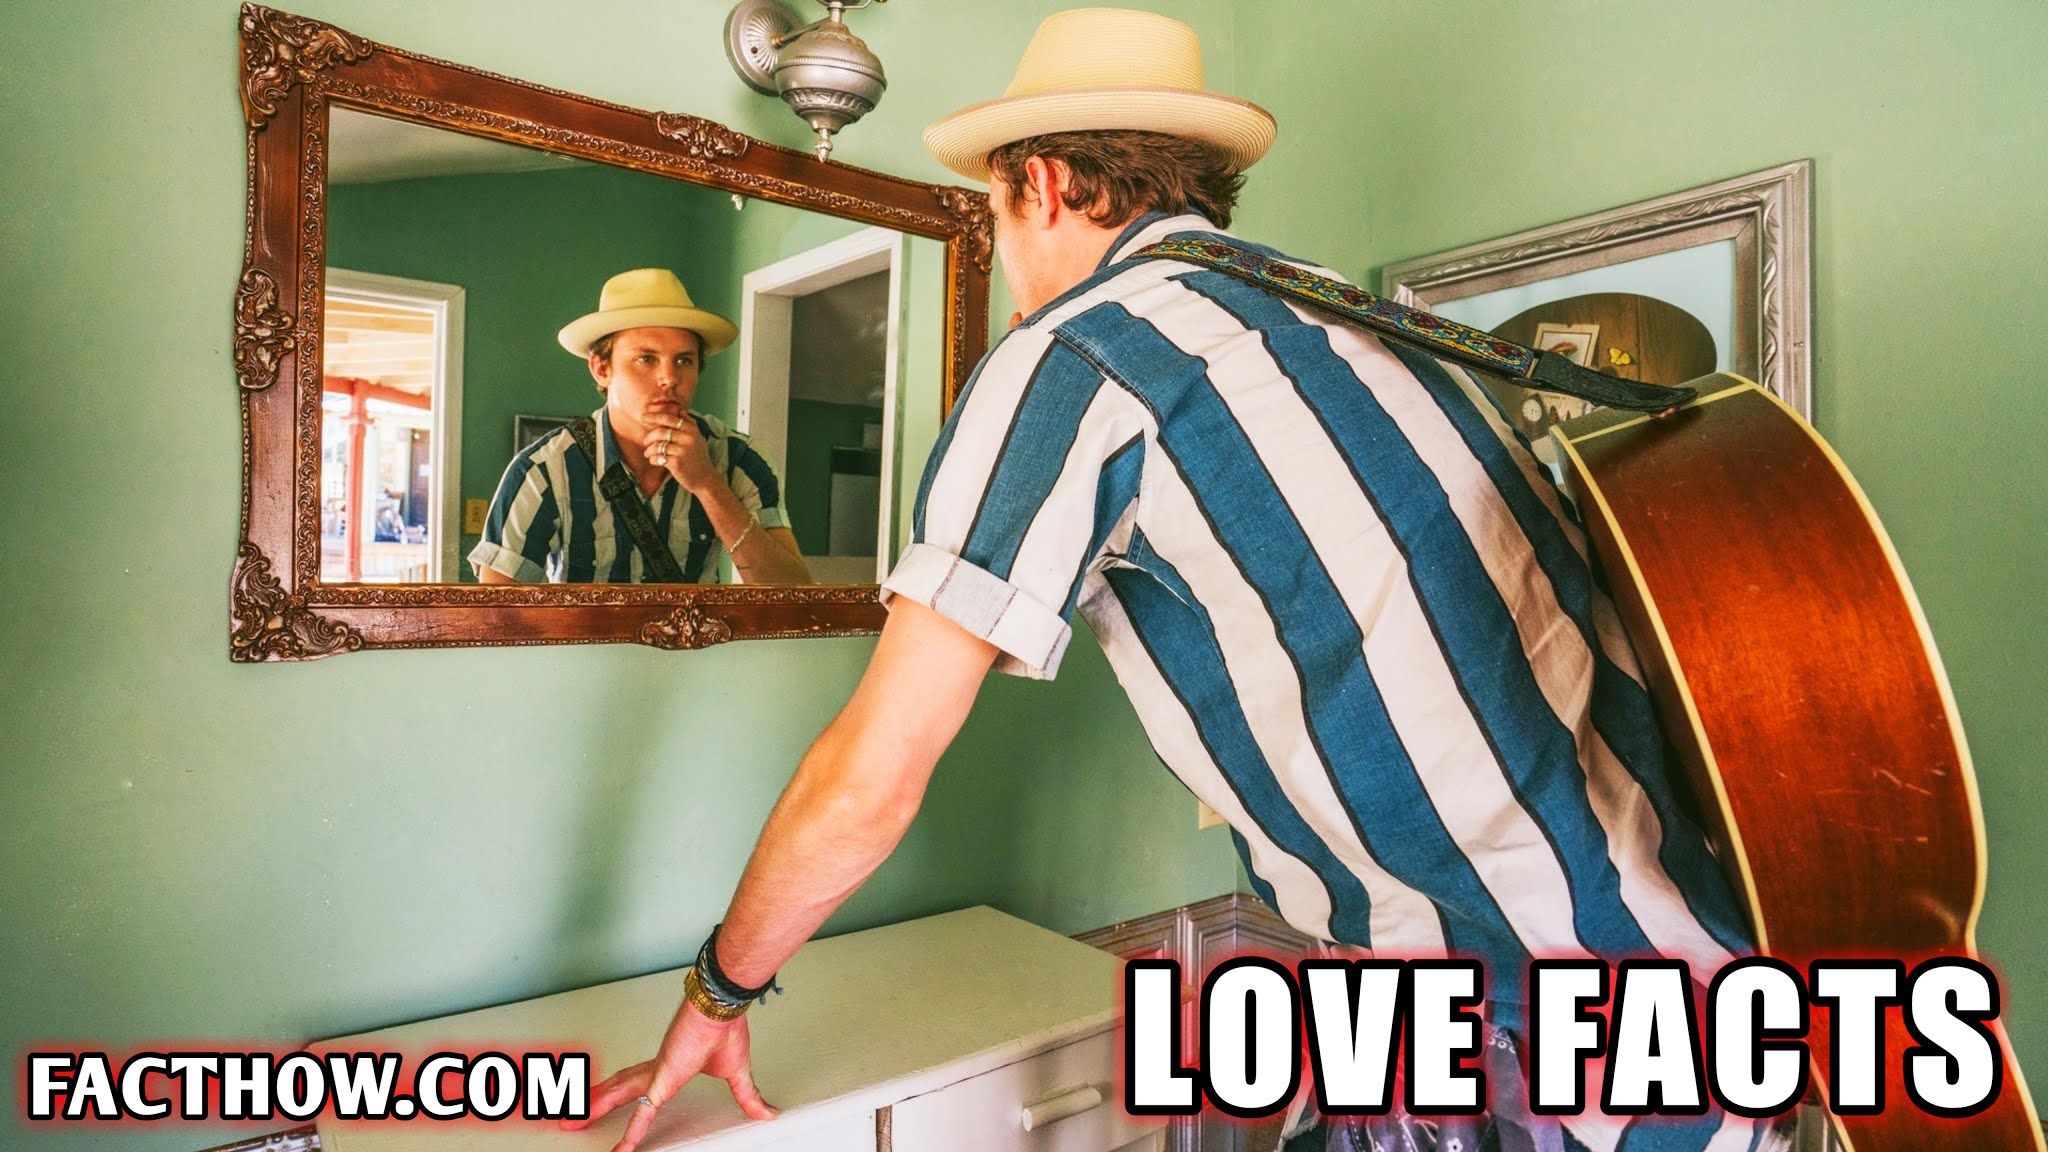 50-Facts-about-love-hindi-pyaar-love-50-rochak-tathya-hindi-facthow-fact-how-pyaar-se-jude-rochak-majedaar-tathya-baate-jankari-hindi-what-is-love-pyaar-kya-hota-hai-love-story-movie-free-download-hindi-love-movies-facts-love-facts-love-movies-downlo